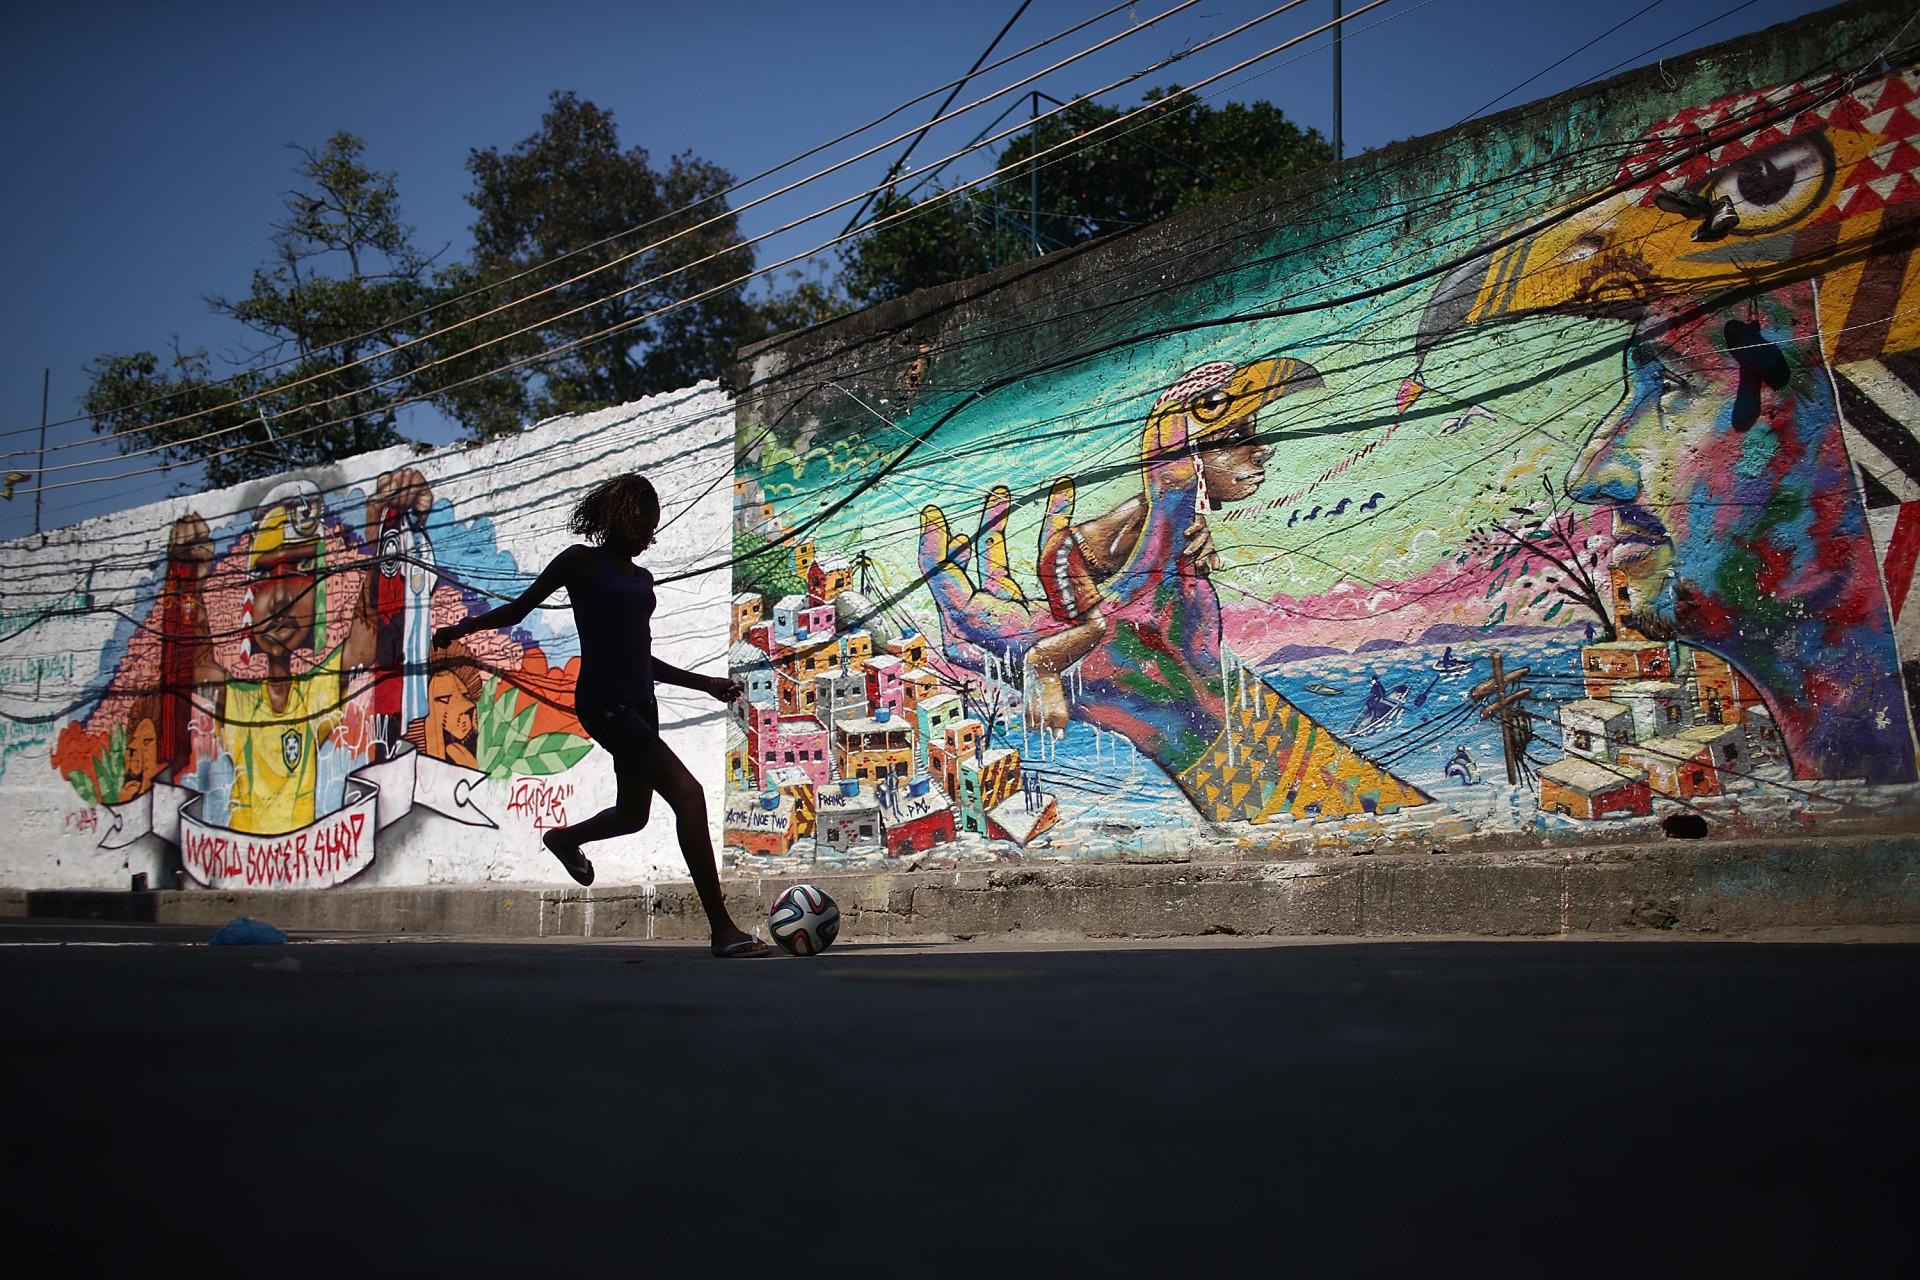 Street art: gorgeous graffiti found around the world